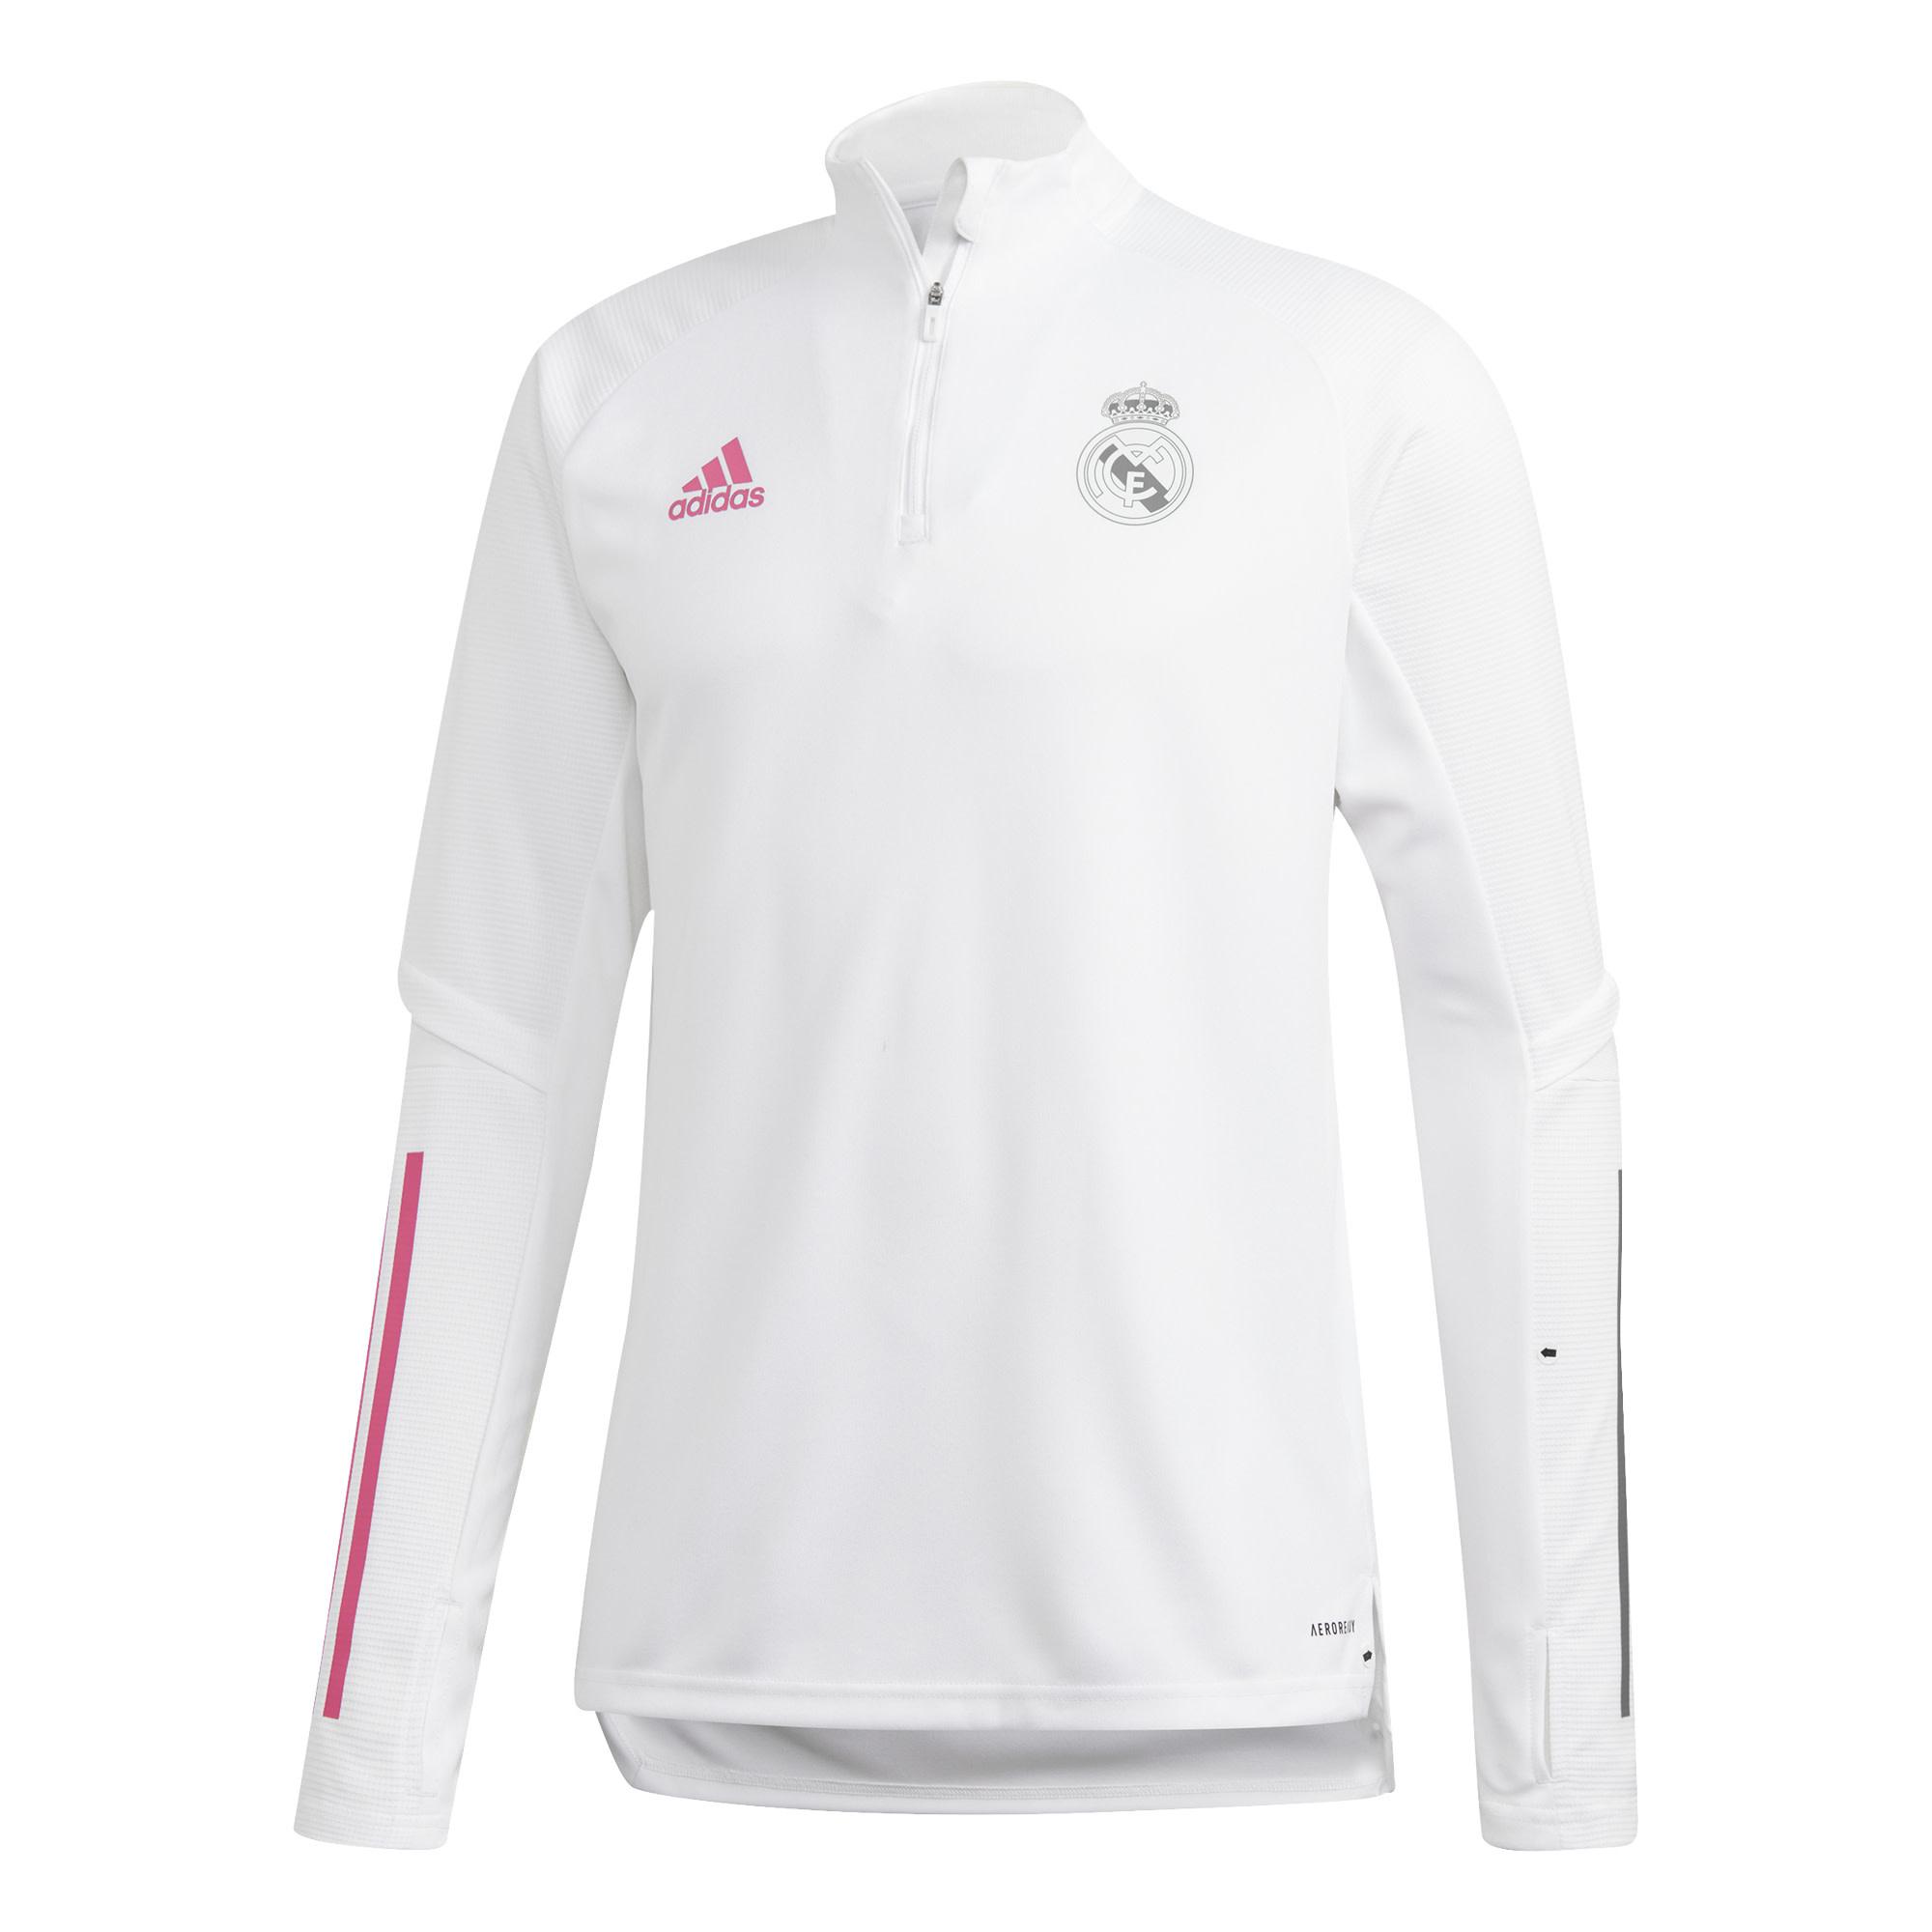 Adidas ADIDAS Real Madrid Training Top